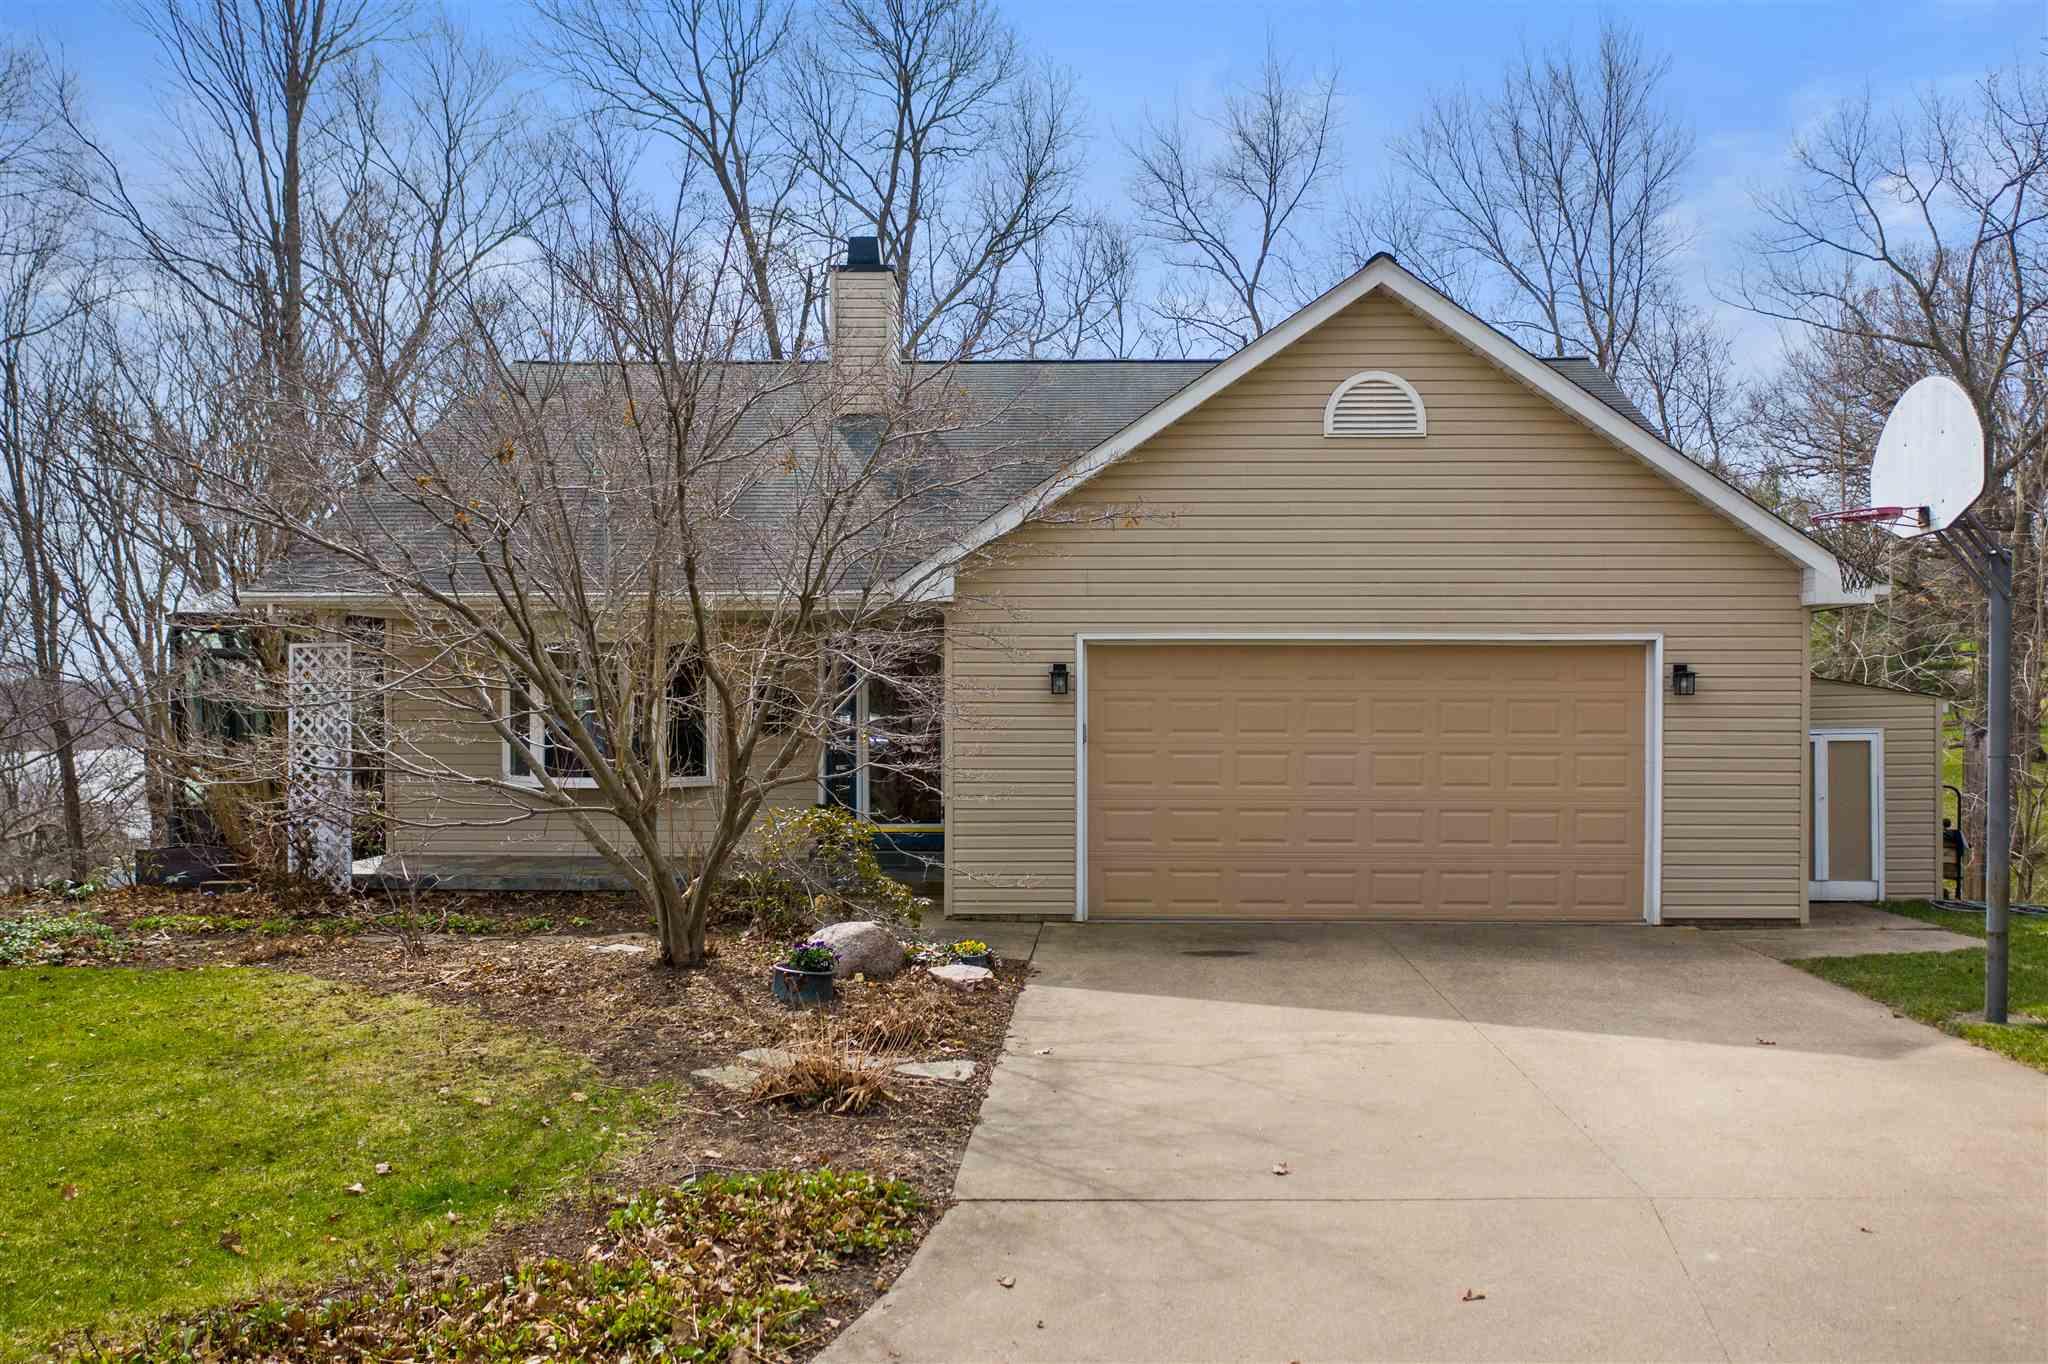 28205 221ST Property Photo - Le Claire, IA real estate listing